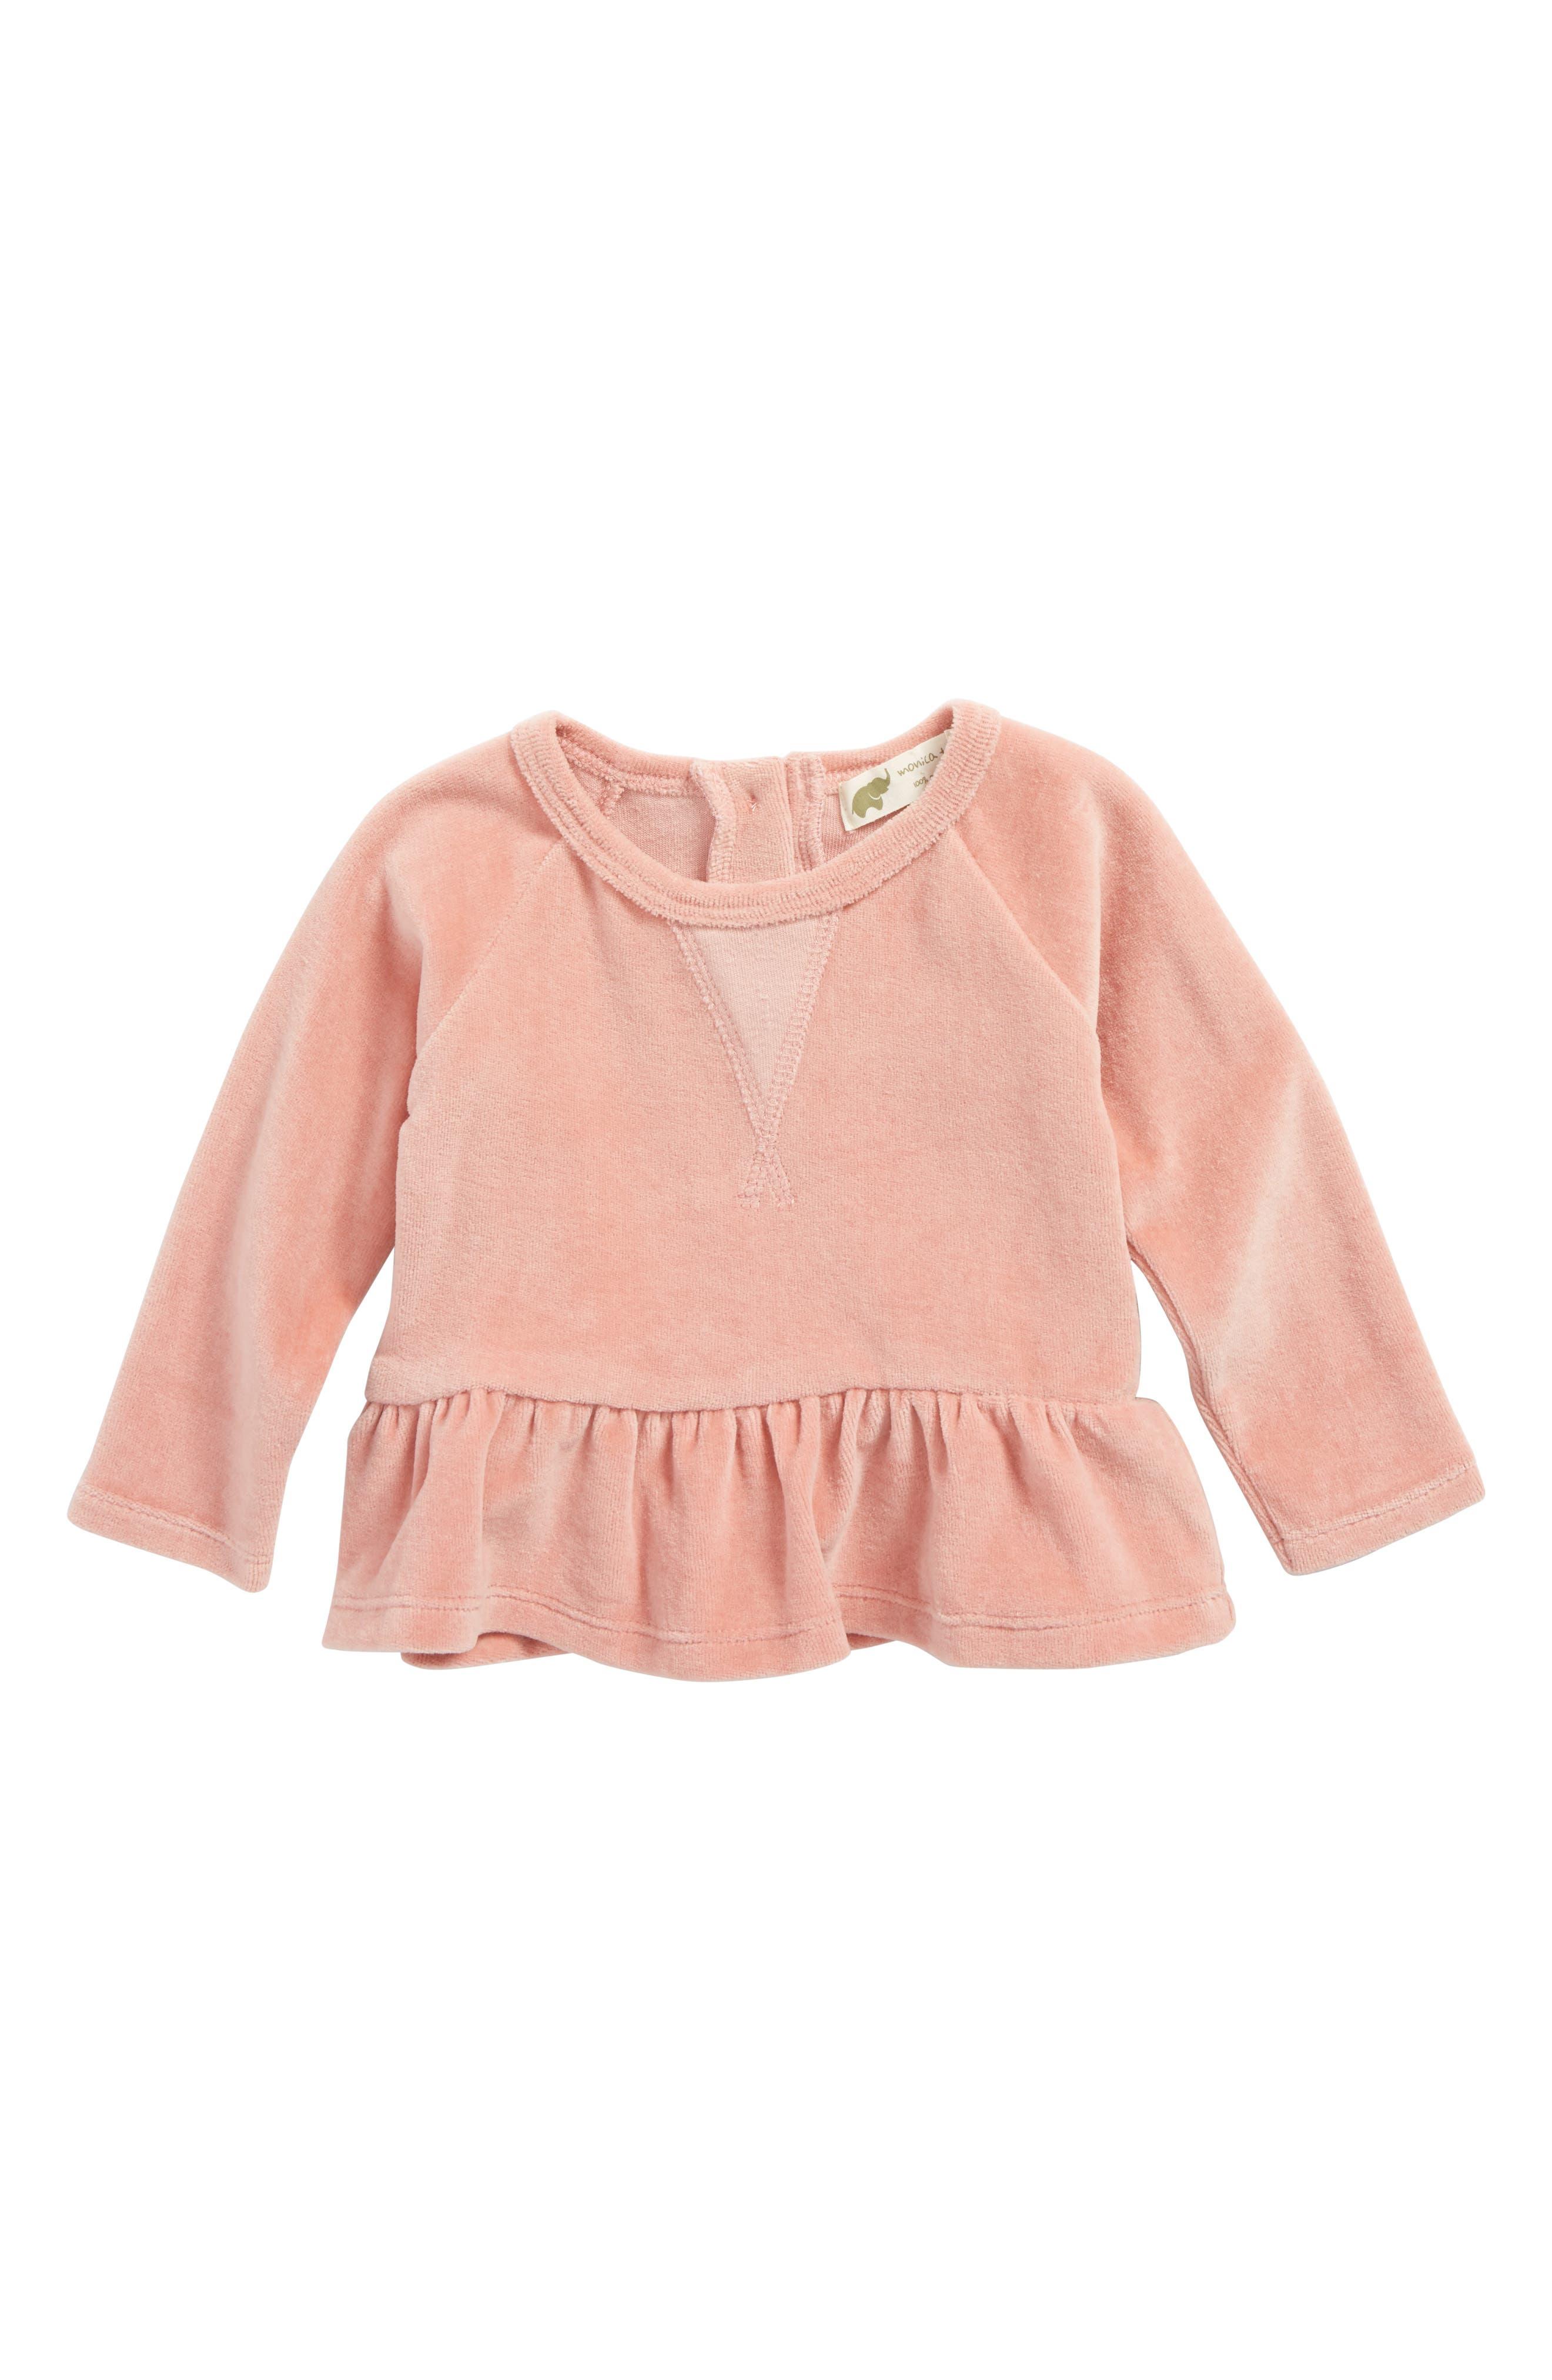 Monica + Andy Organic Cotton Velour Sweatshirt Dress (Baby Girls)